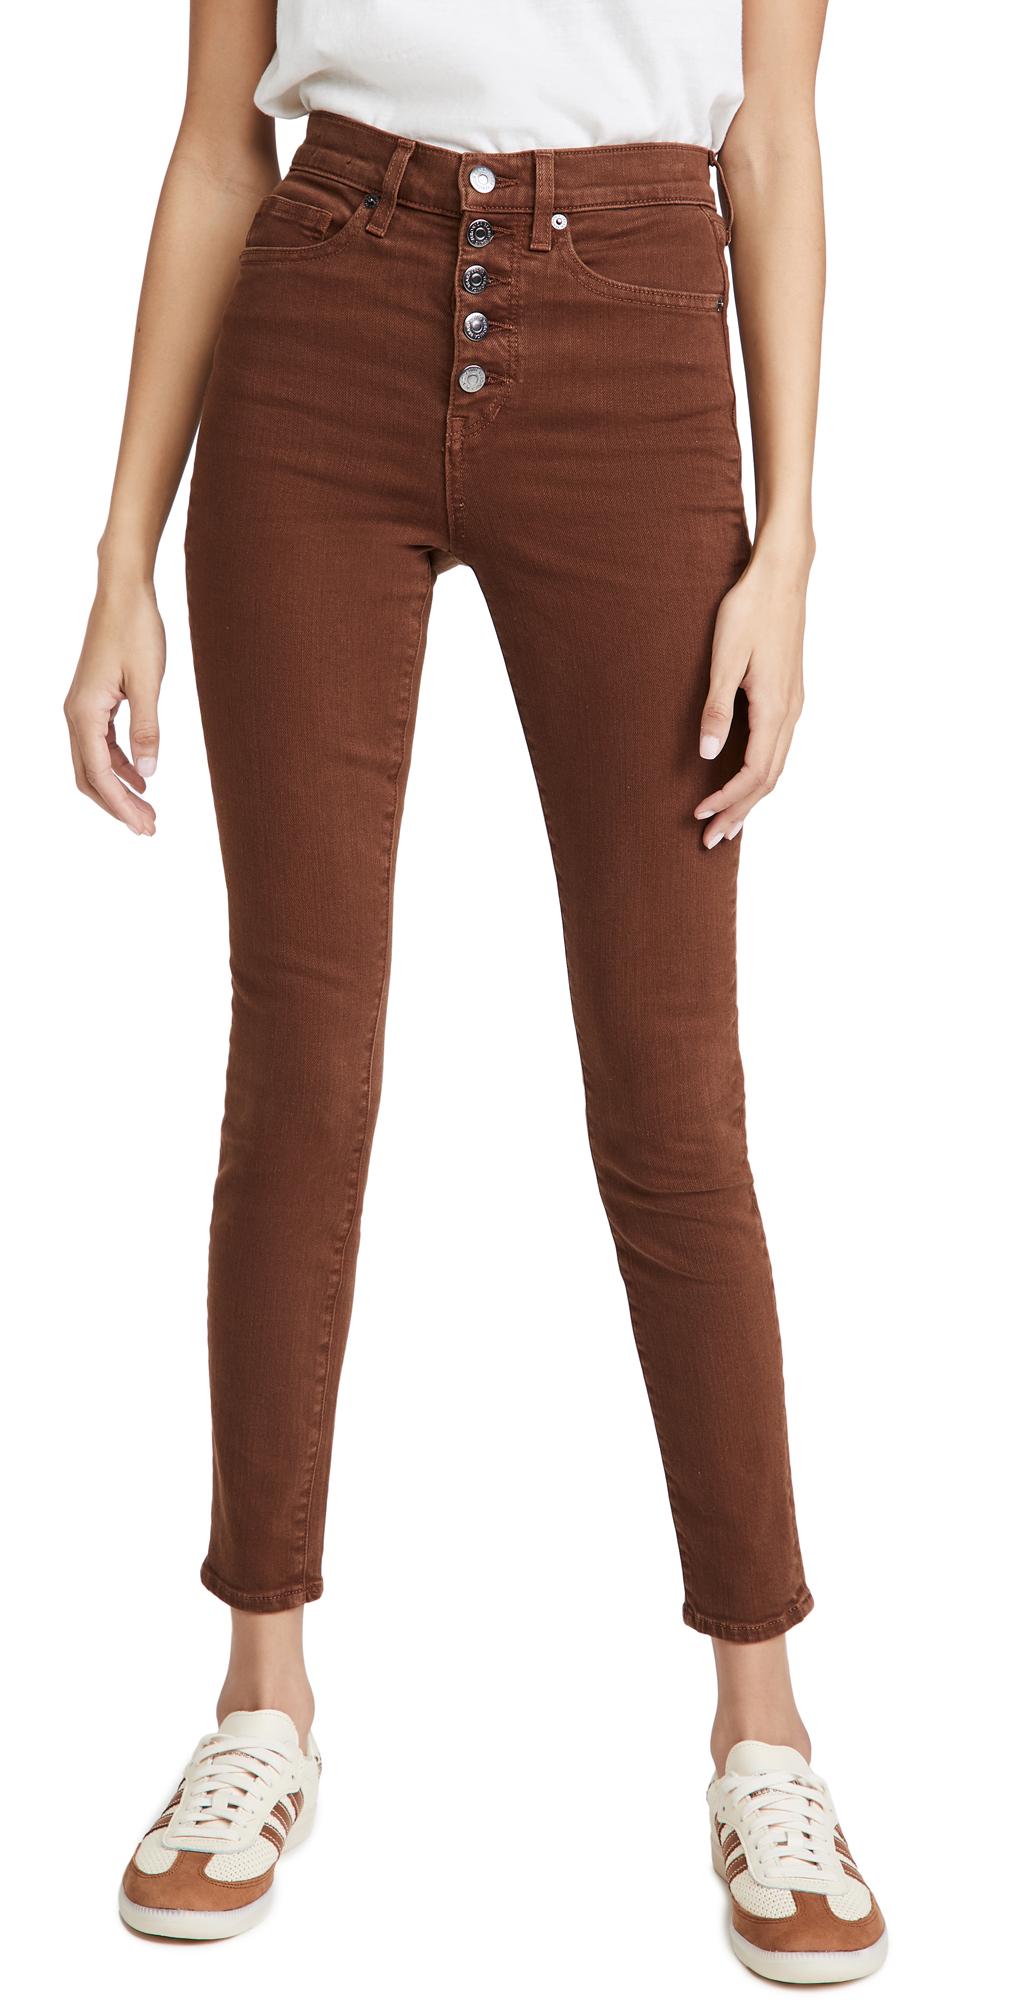 Veronica Beard Jean Maera Extra High Rise Skinny Jeans